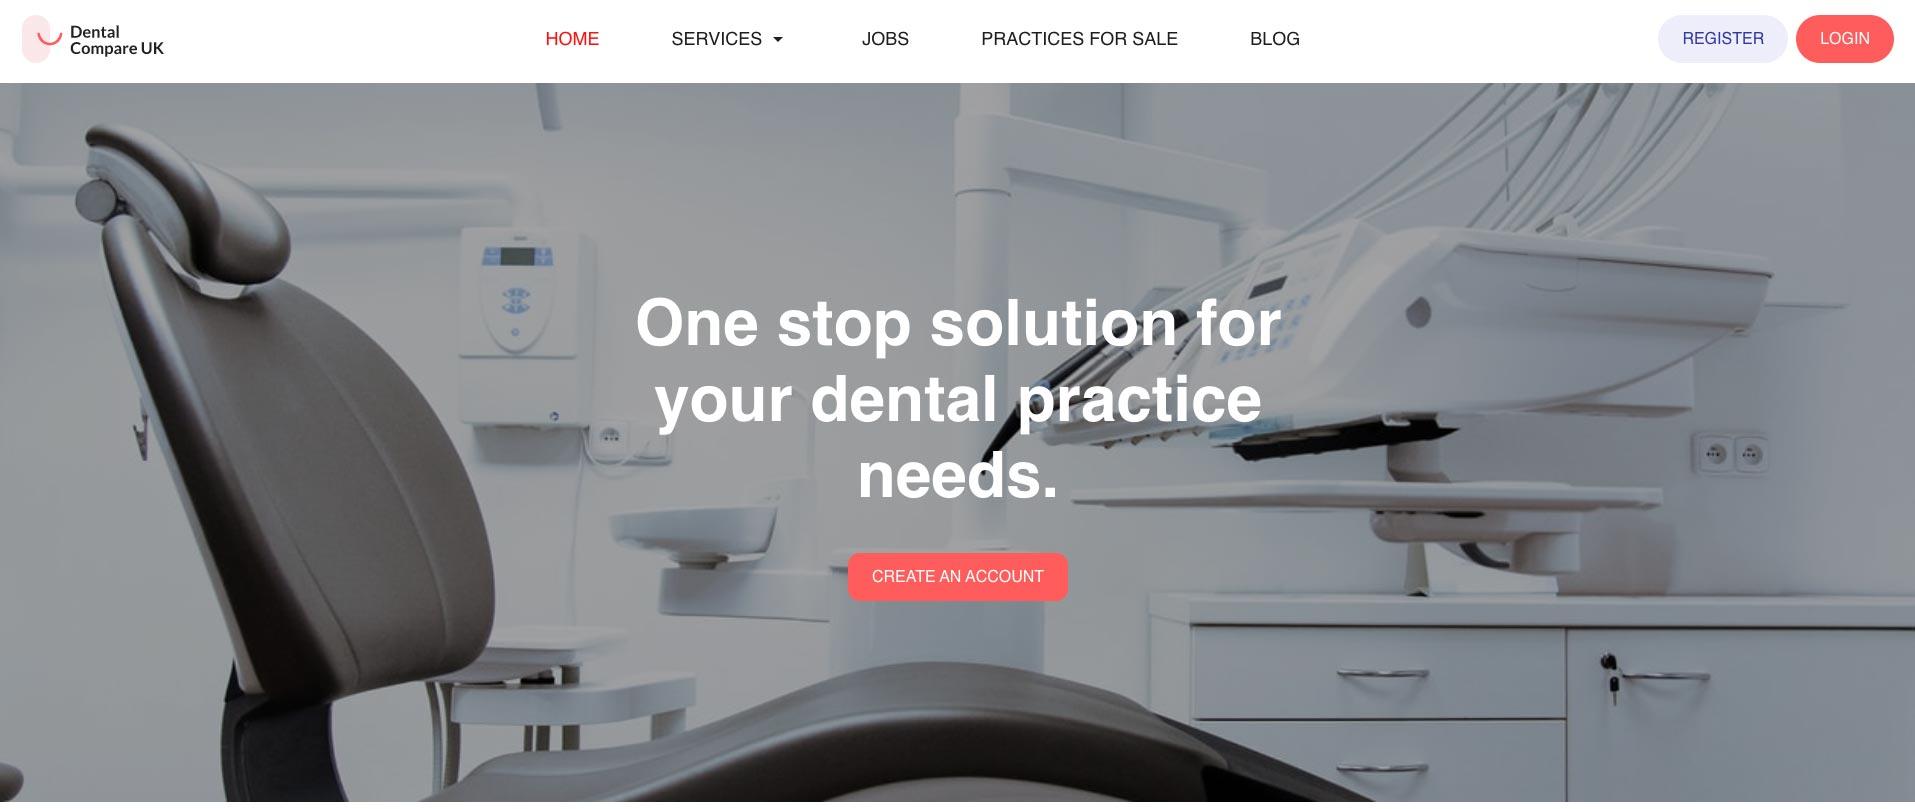 Dental Compare website